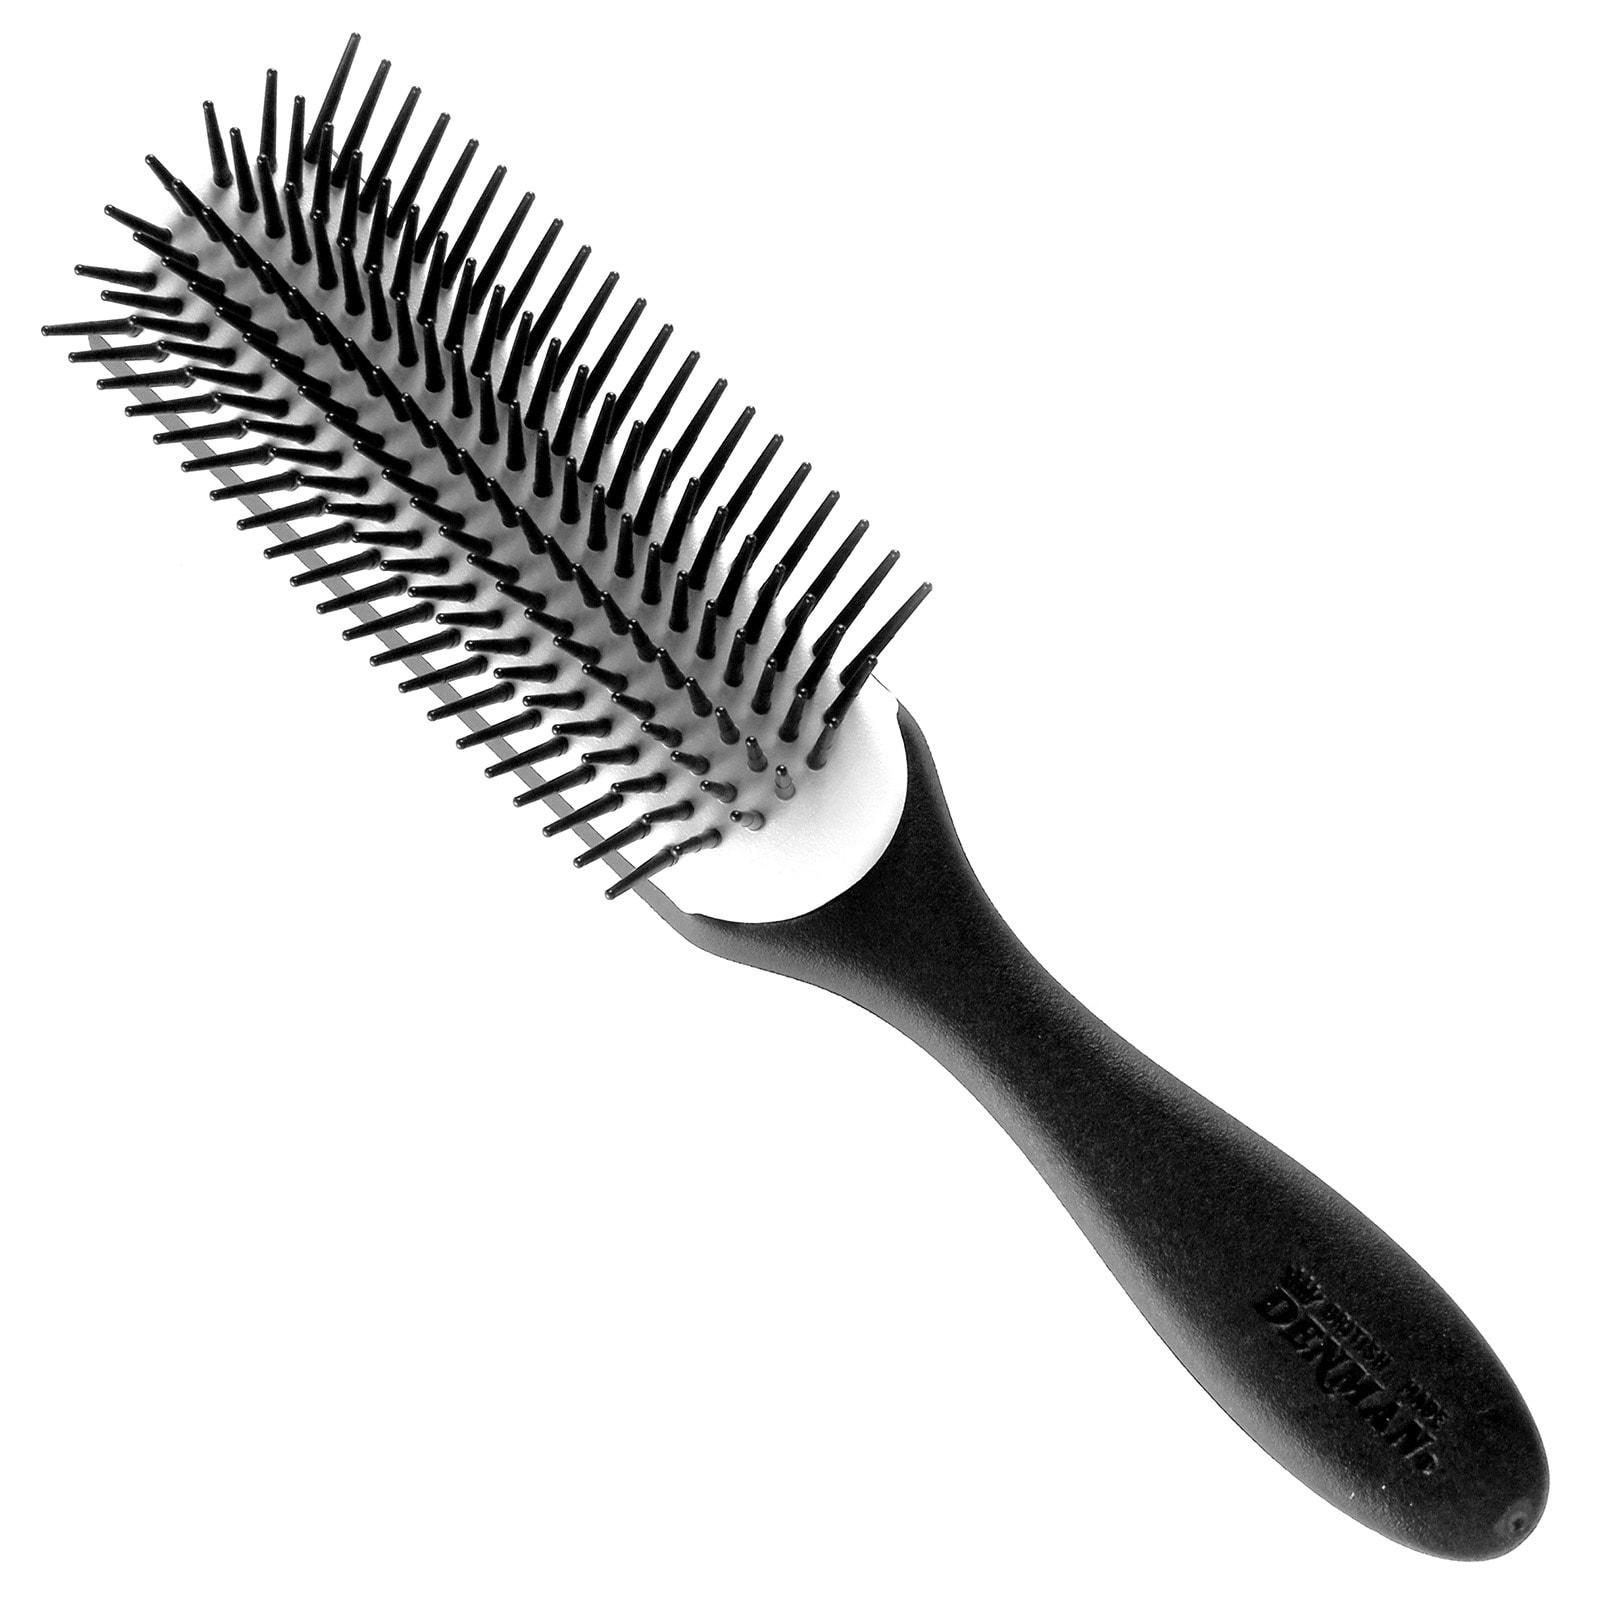 Denman D3N Noir Medium 7 Rows Black Styling Brush